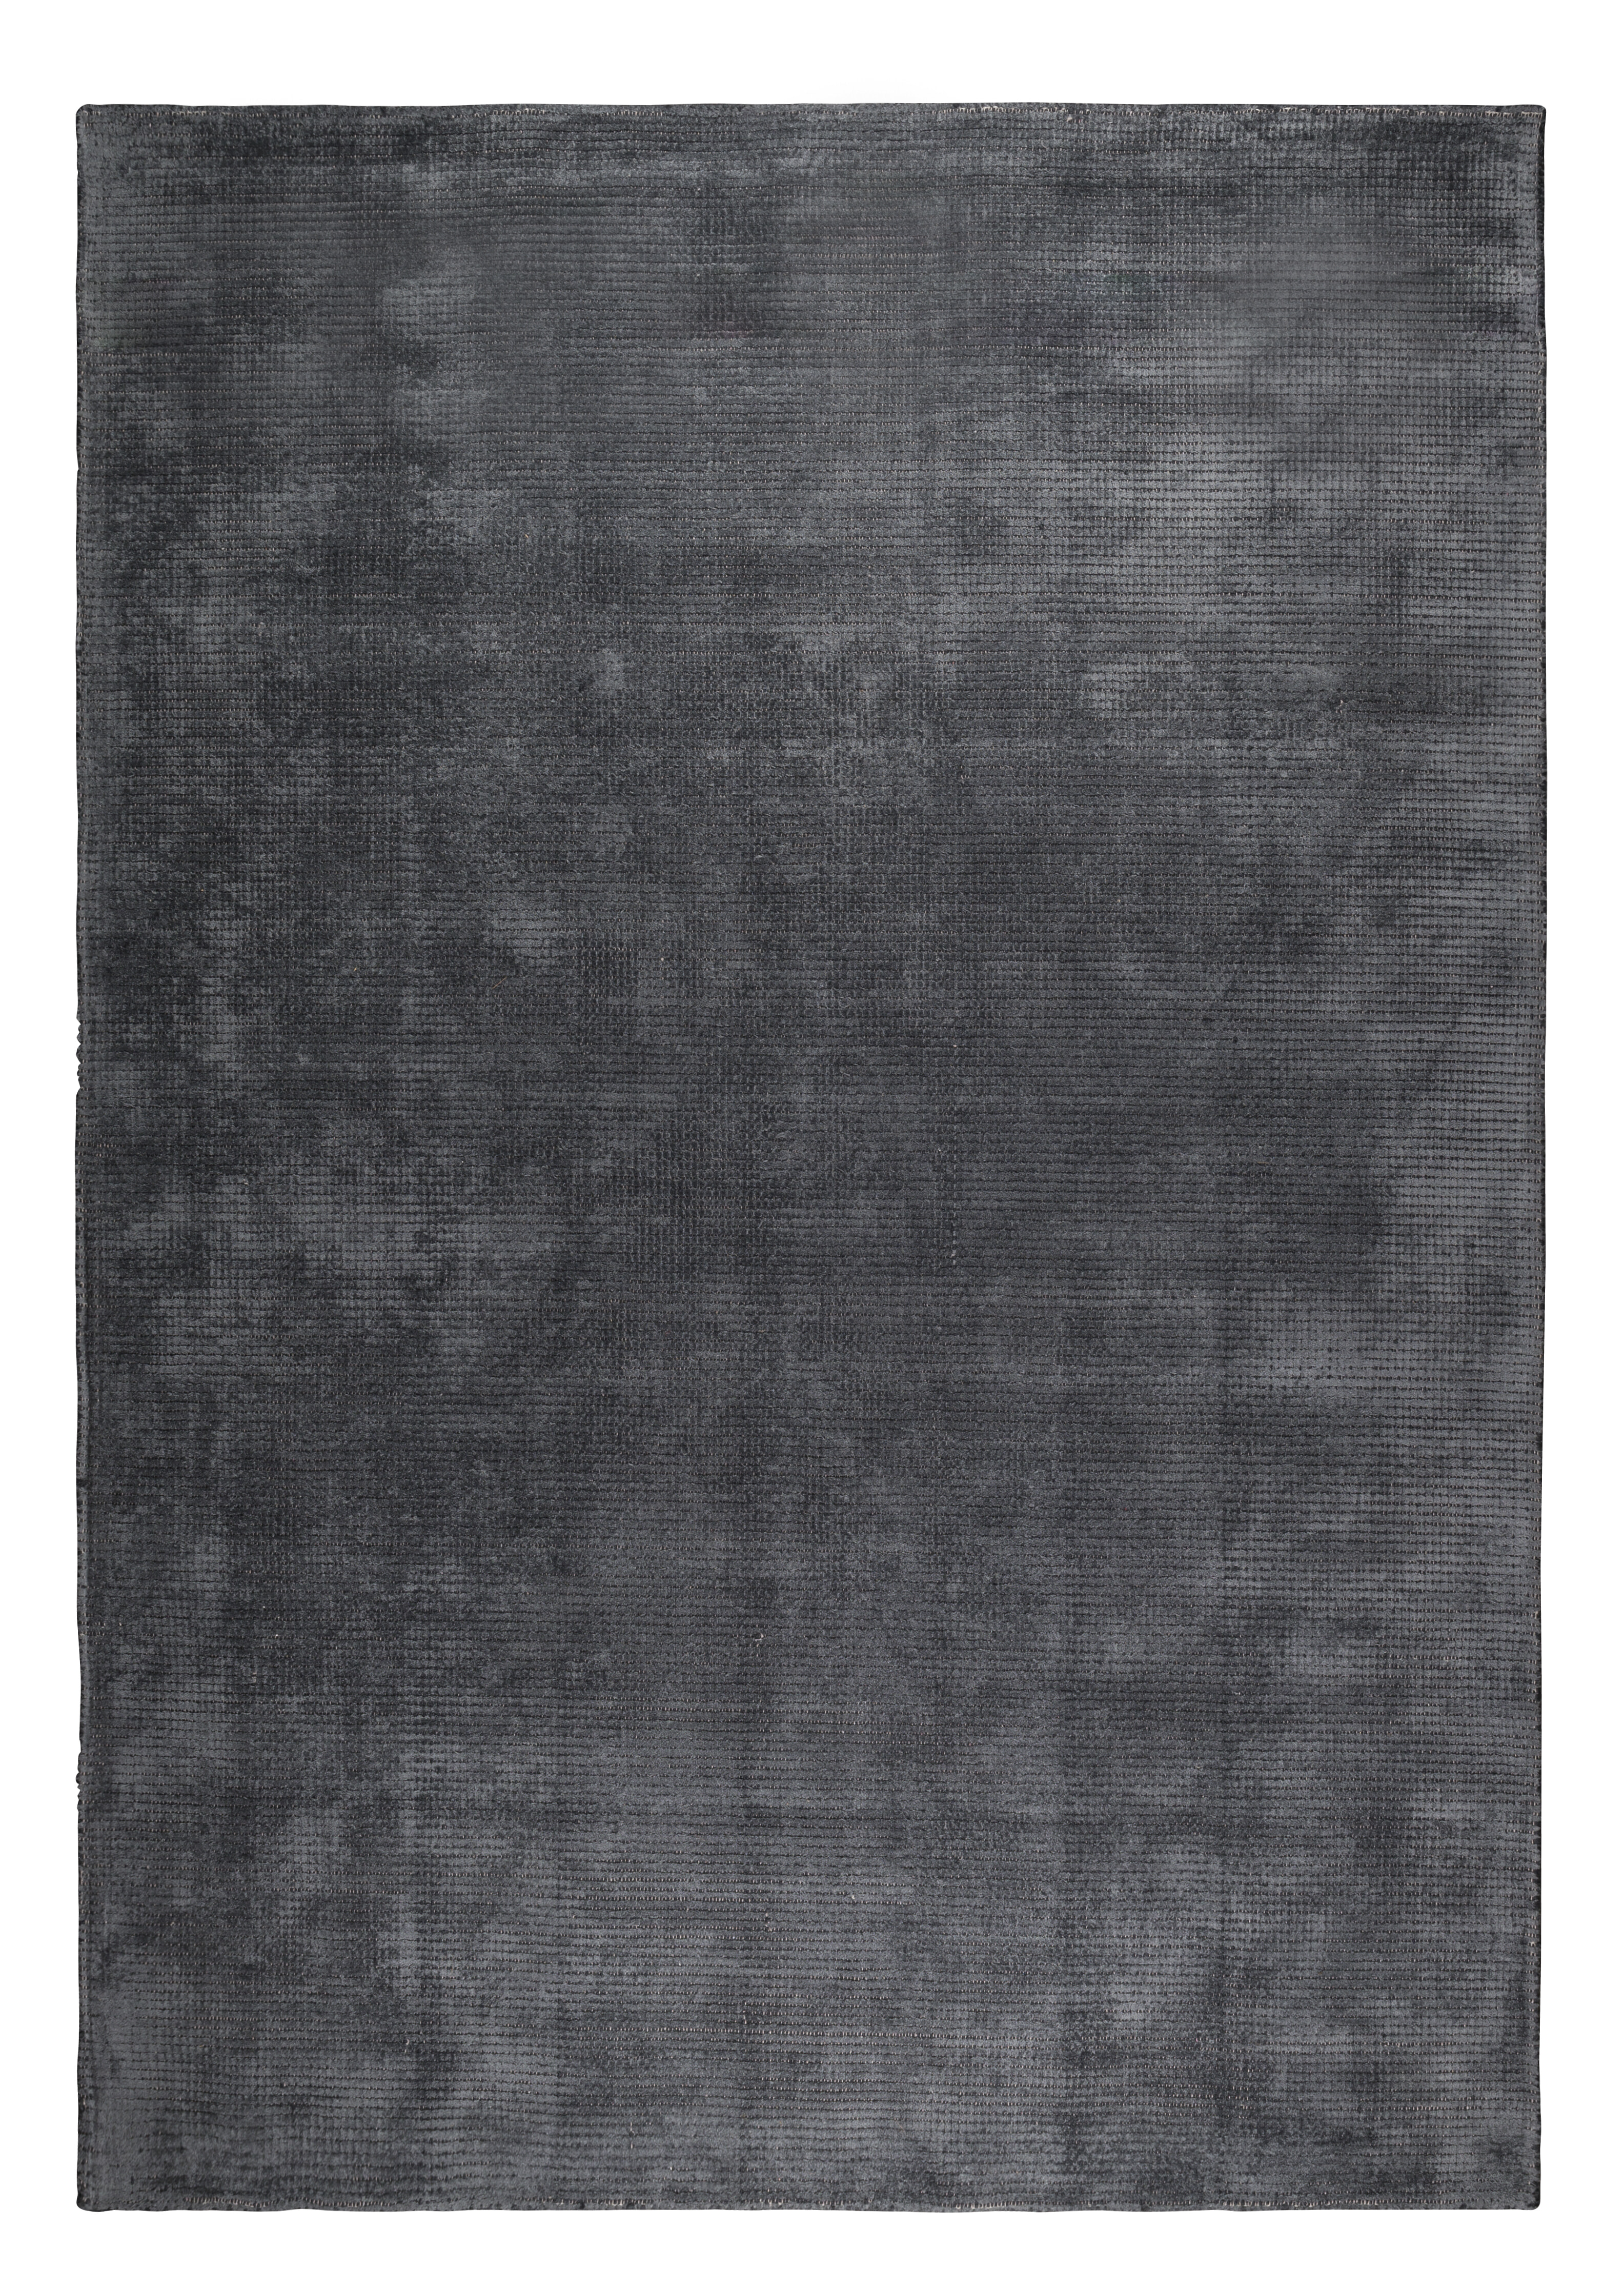 Vloerkleed 'Rymer' 170 x 240cm, kleur leigrijs 60% viscose, 40% polyester aanschaffen? Kijk hier!